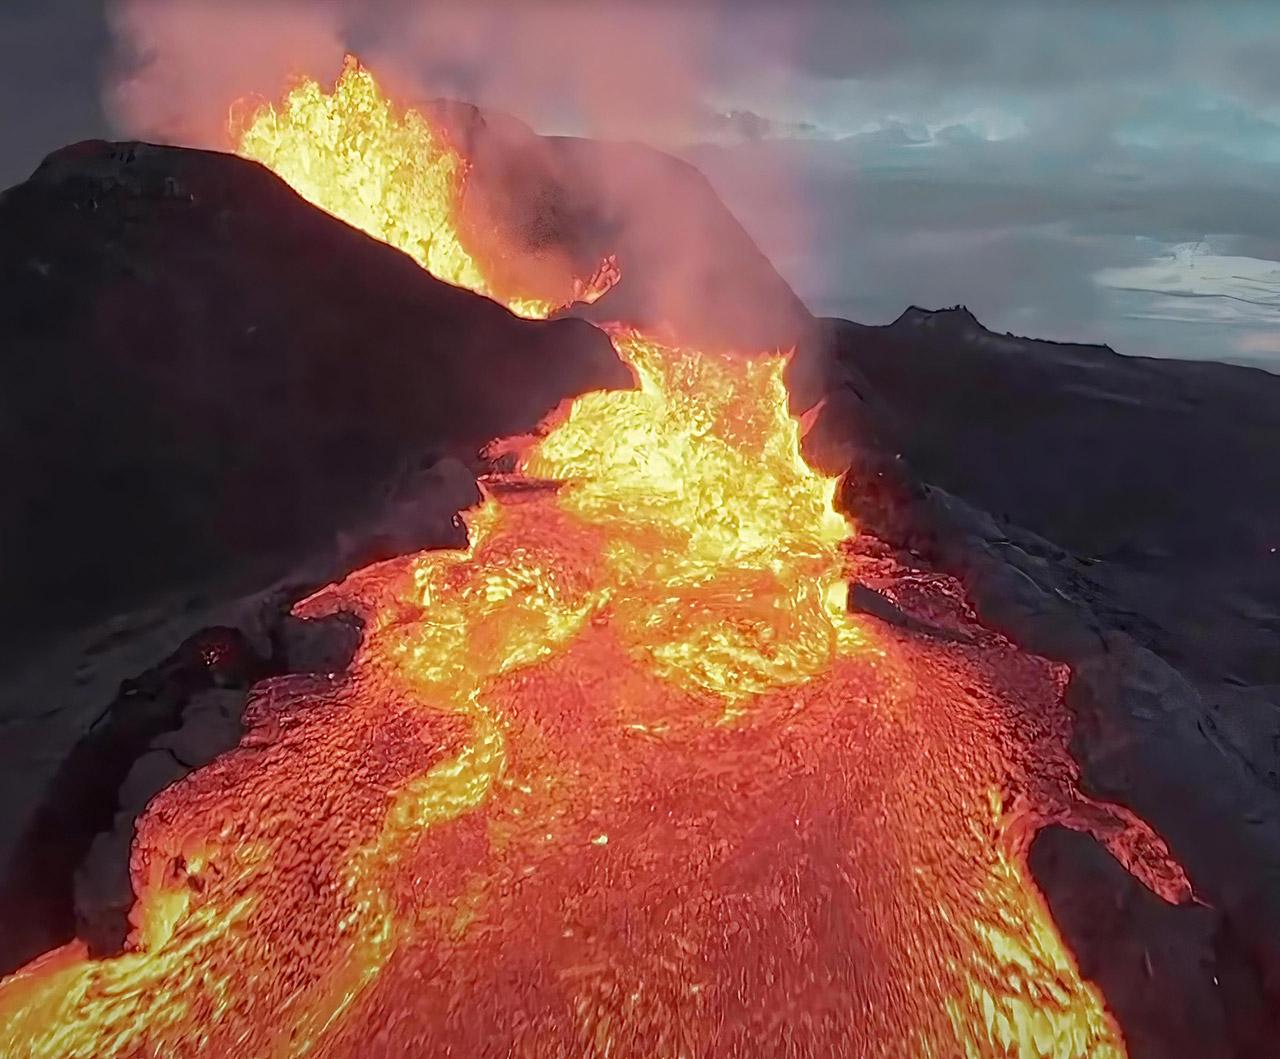 DJI FPV Drone Iceland Volcano Crash